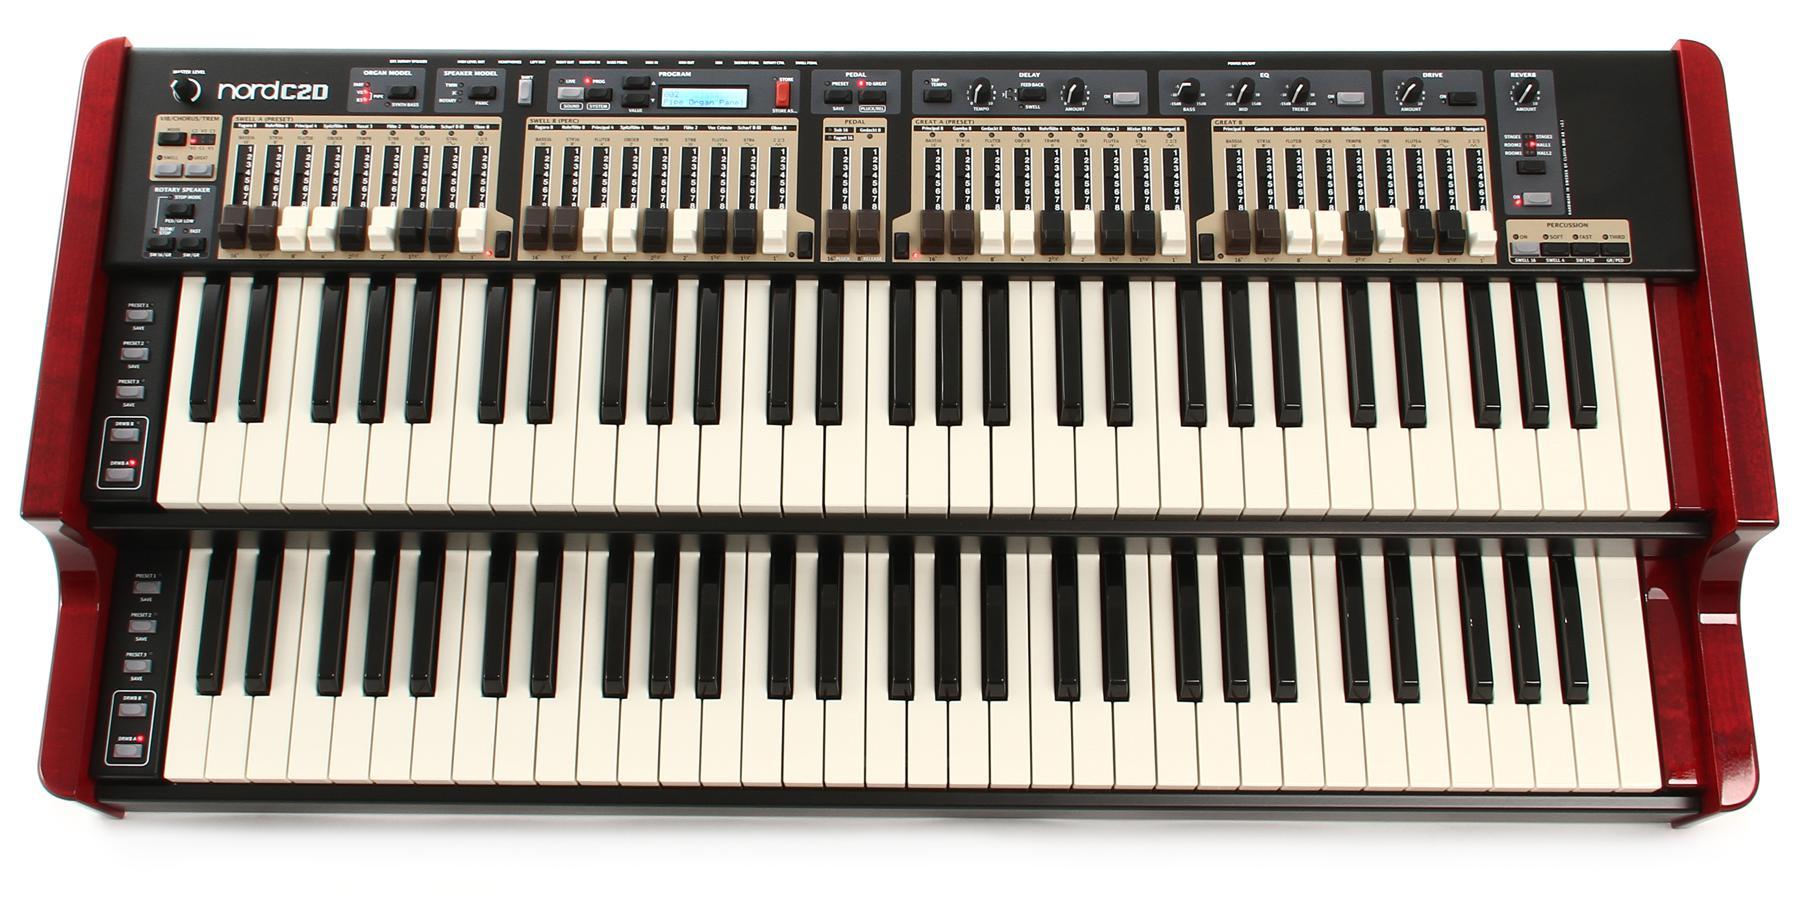 Double manual F to F MIDI harpsichord ? - Gearslutz